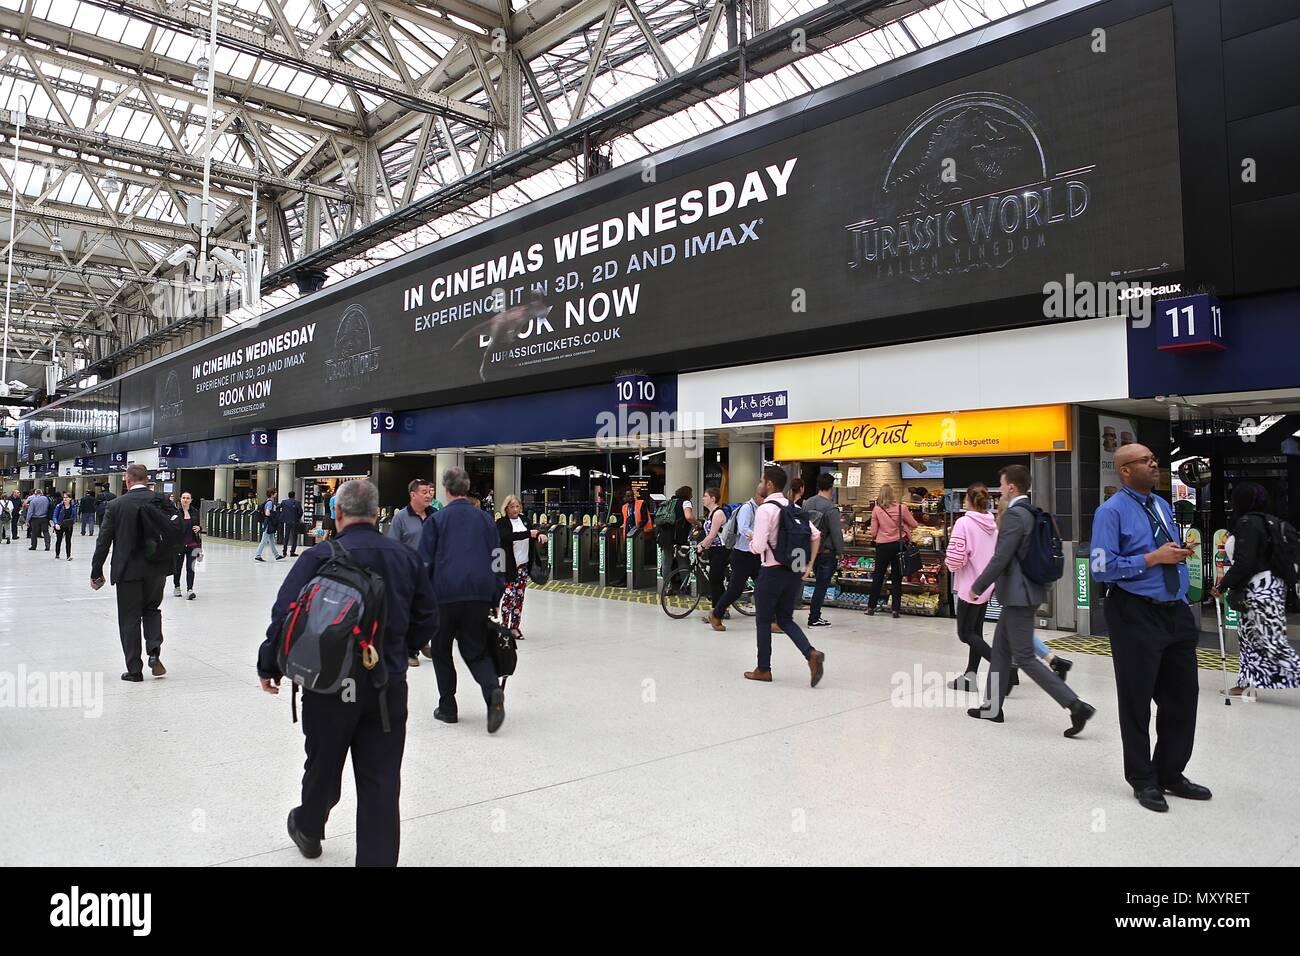 Waterloo Station London England - Stock Image